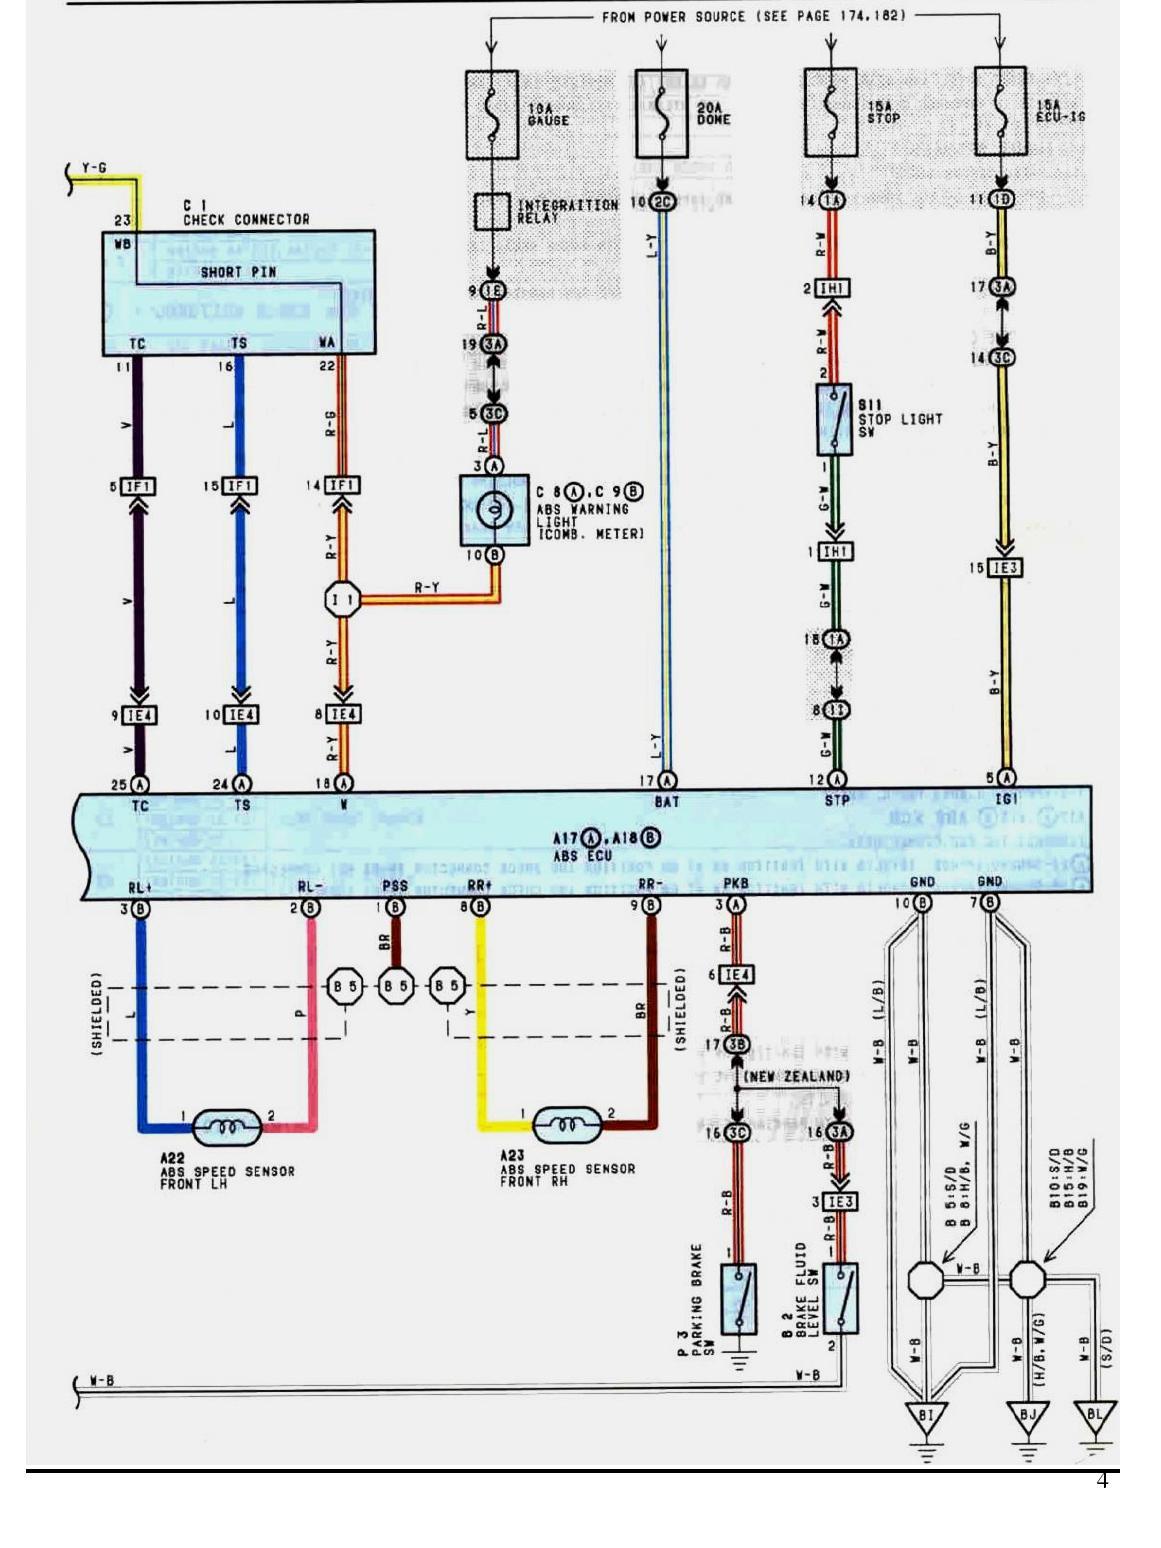 [DIAGRAM_38EU]  NN_5107] Rover 75 Central Locking Wiring Diagram Schematic Wiring | Rover 75 Central Locking Wiring Diagram |  | Pneu Mecad Gho Emba Mohammedshrine Librar Wiring 101